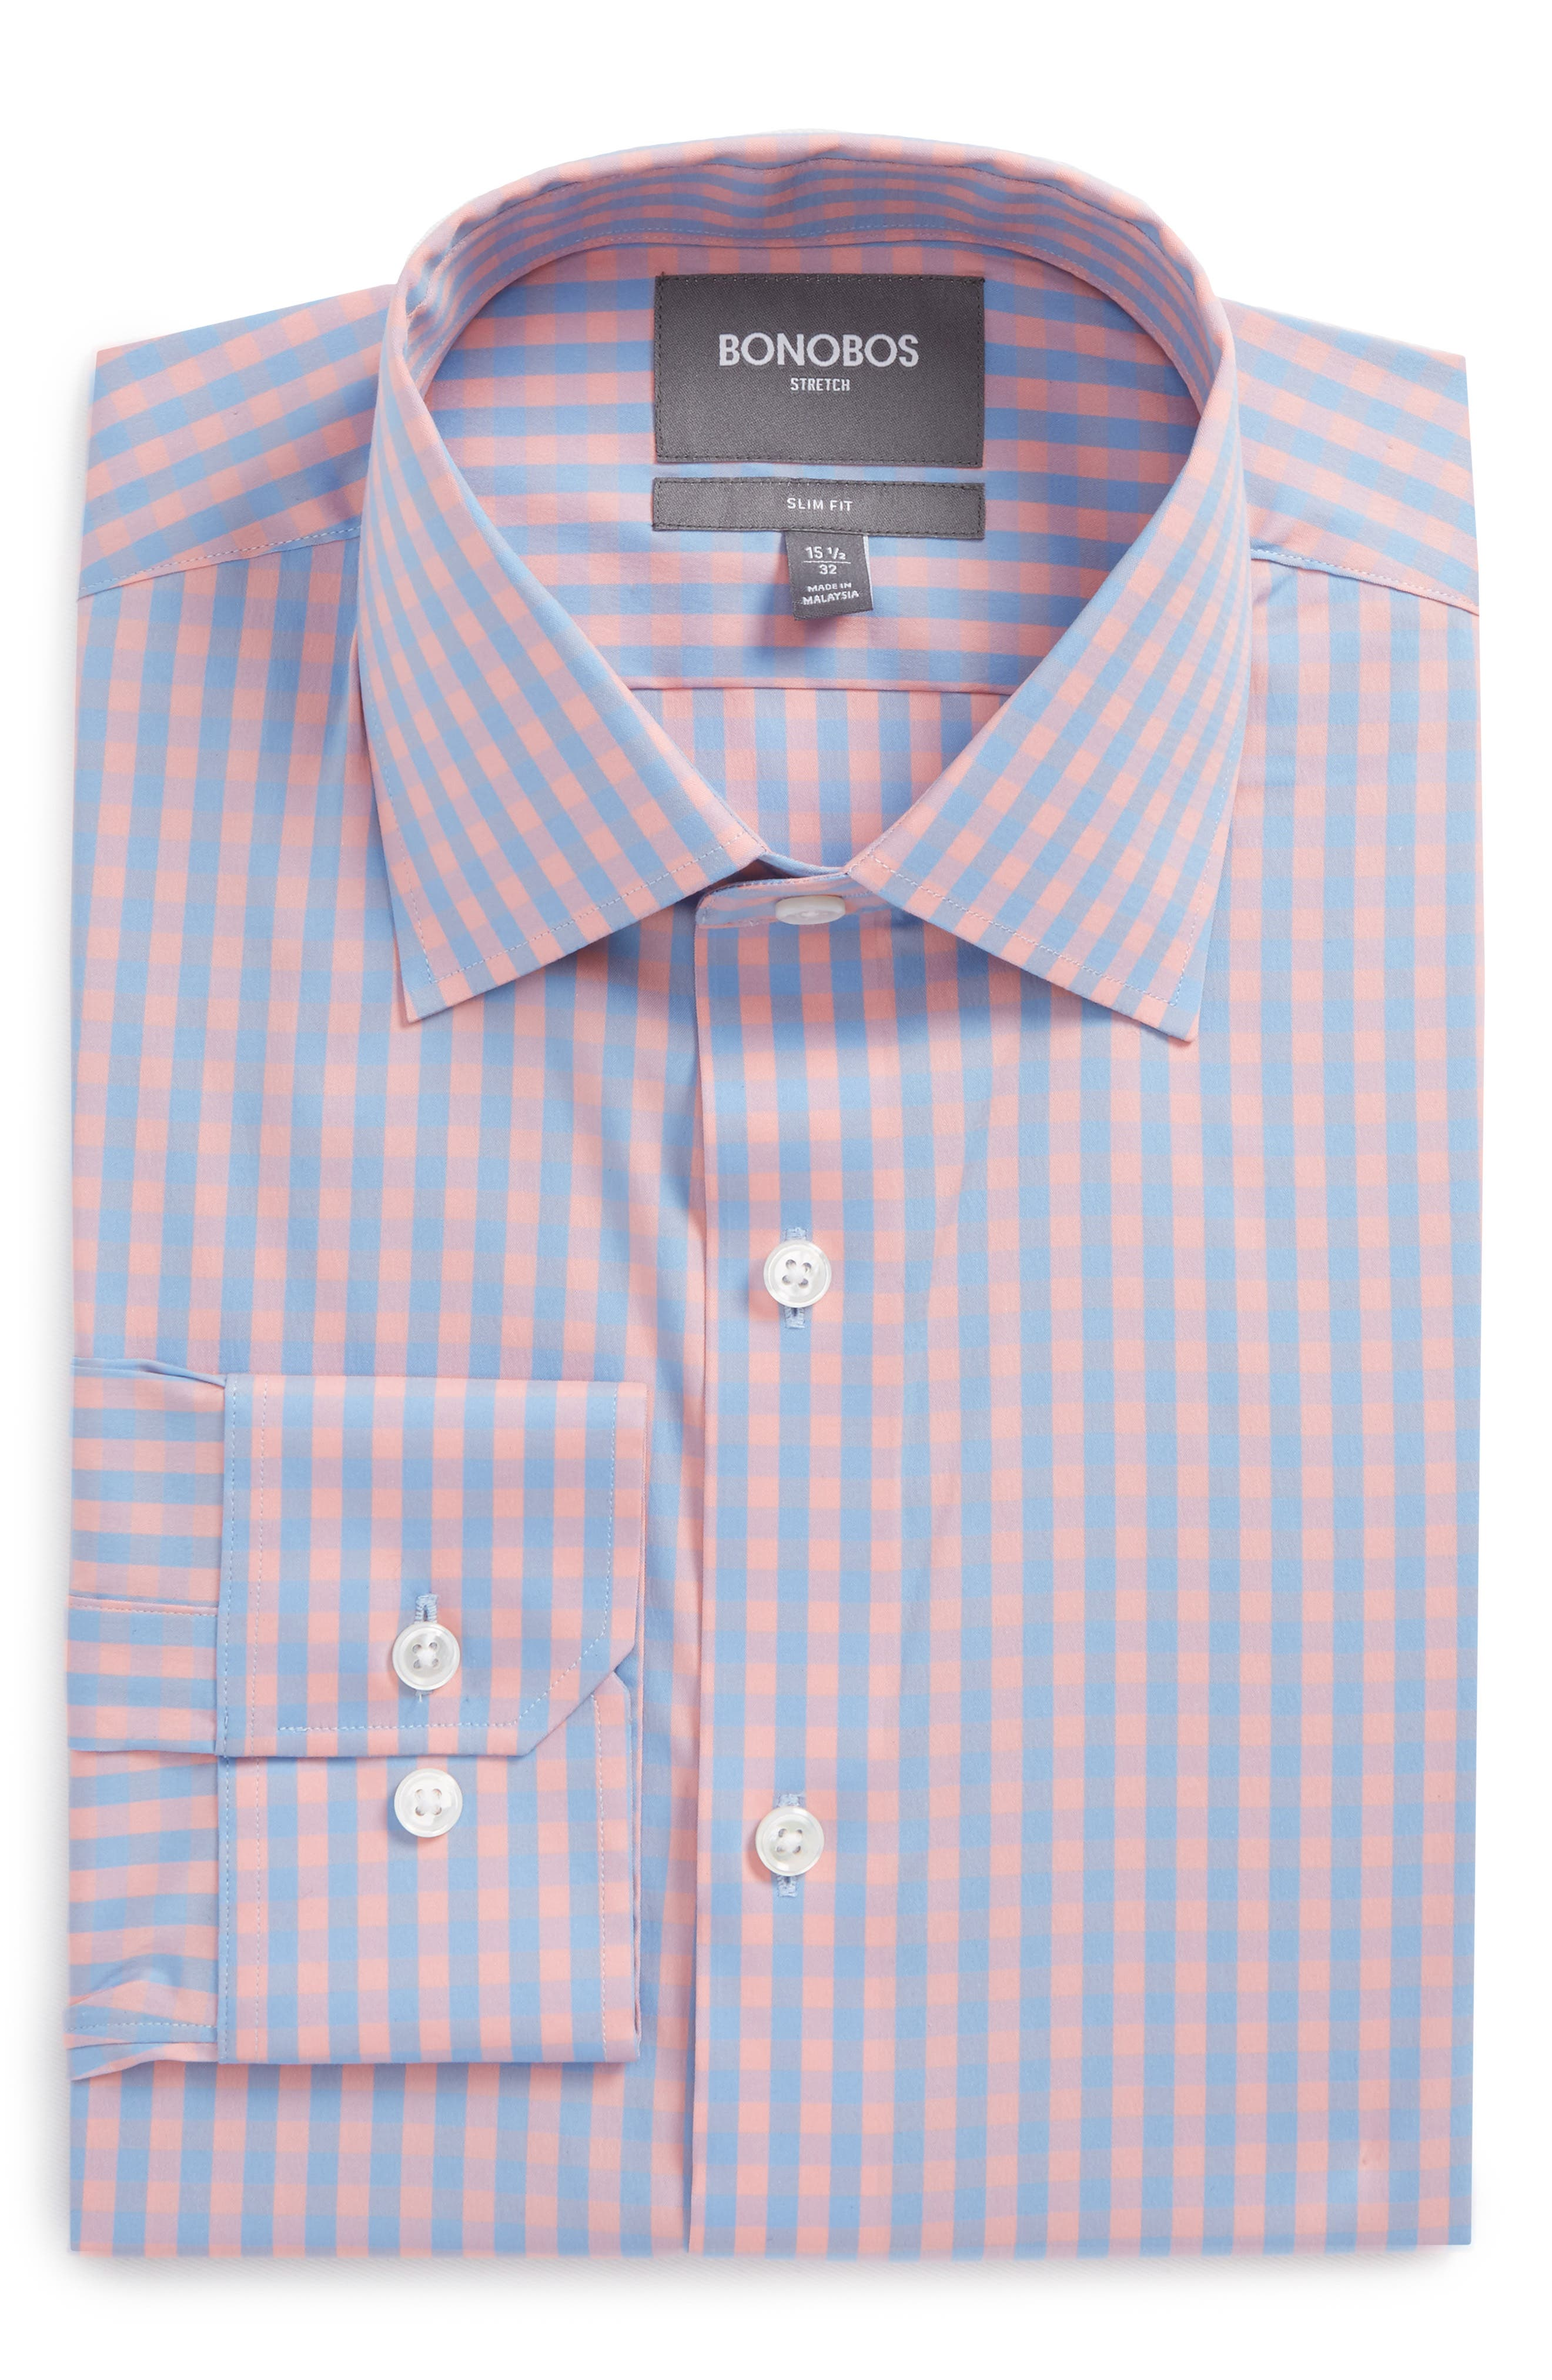 Jetsetter Slim Fit Stretch Check Dress Shirt,                             Alternate thumbnail 5, color,                             650